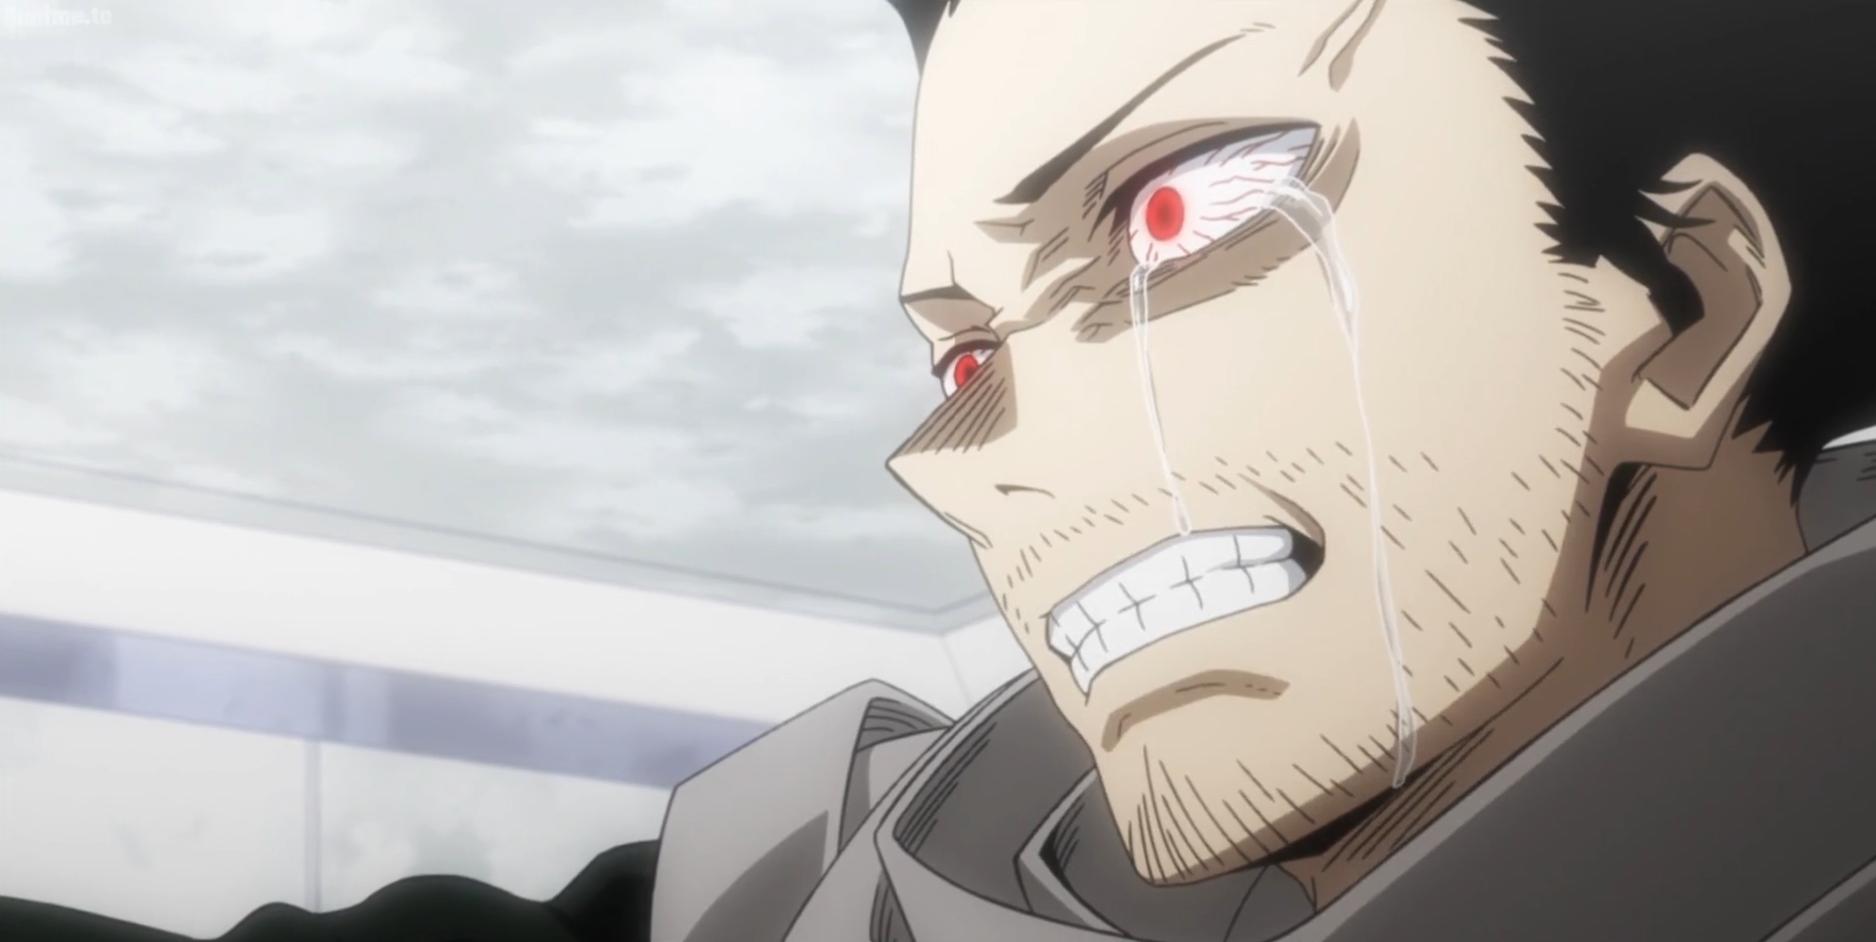 Shota Aizawa crying over Oboro